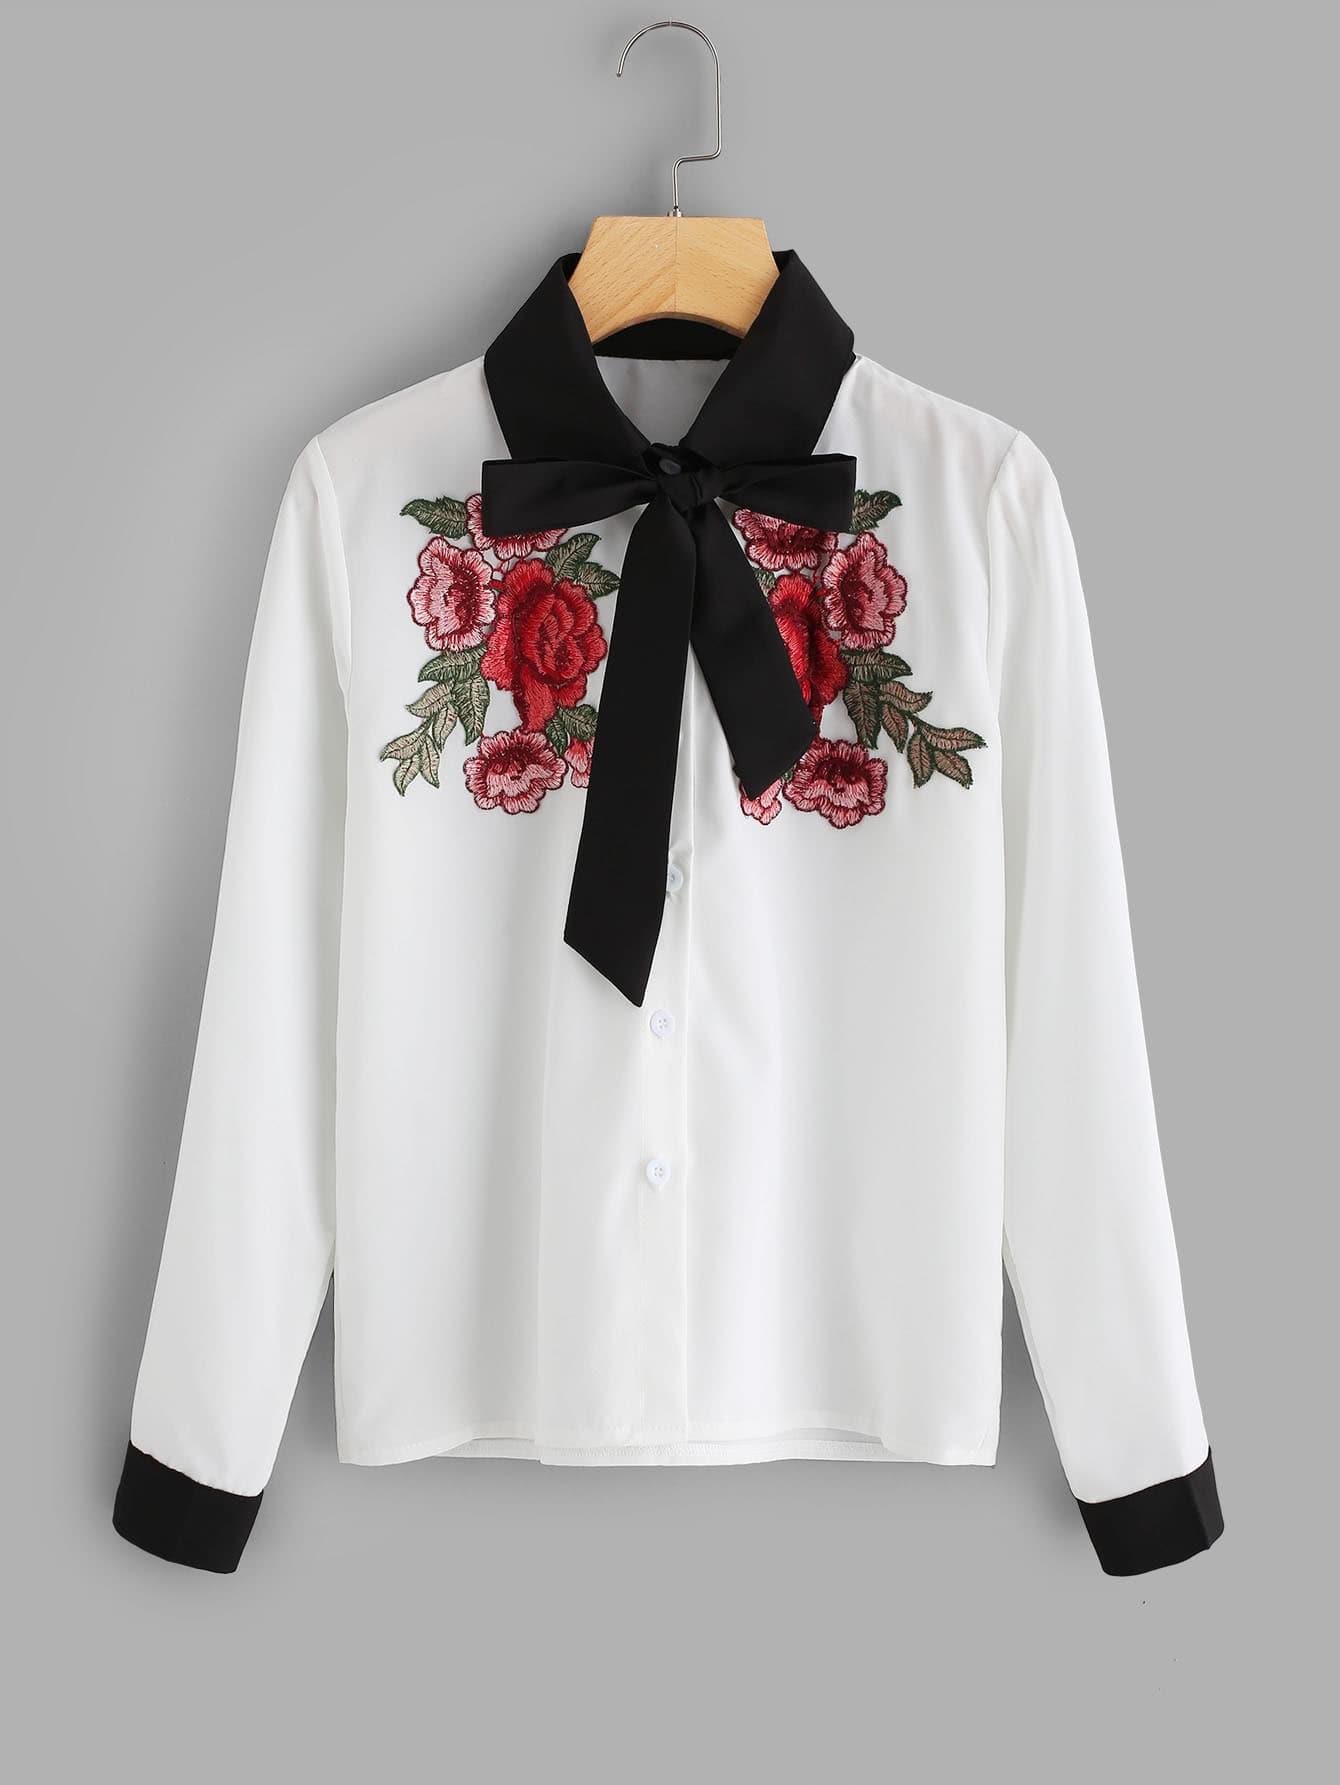 Contrast Trim Tie Neck Embroidered Applique Shirt